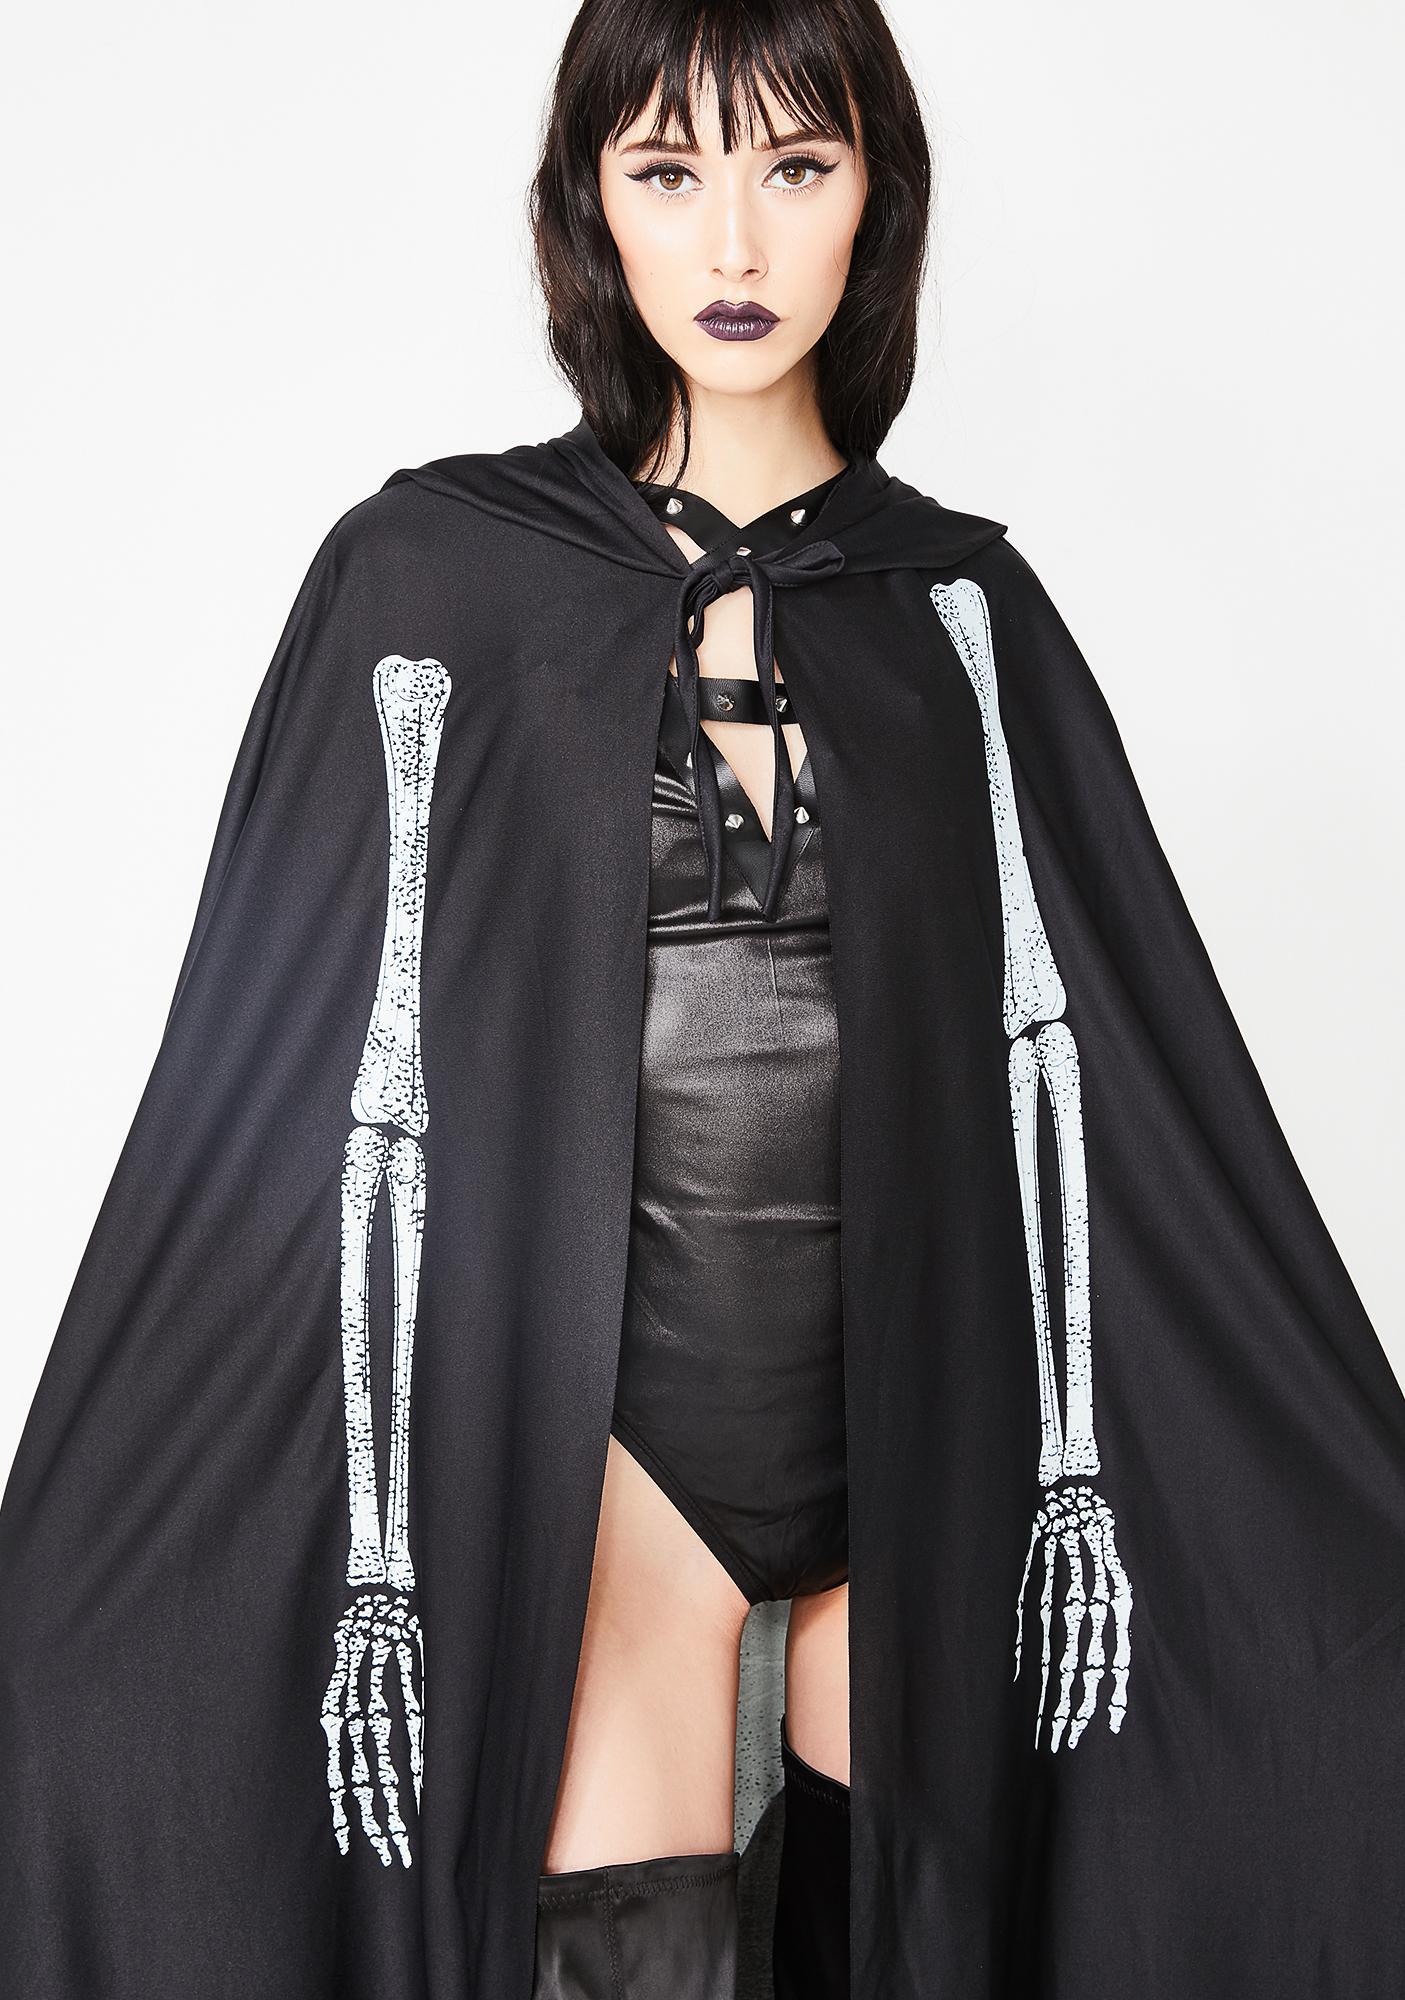 Crypt Keeper Skeleton Cape